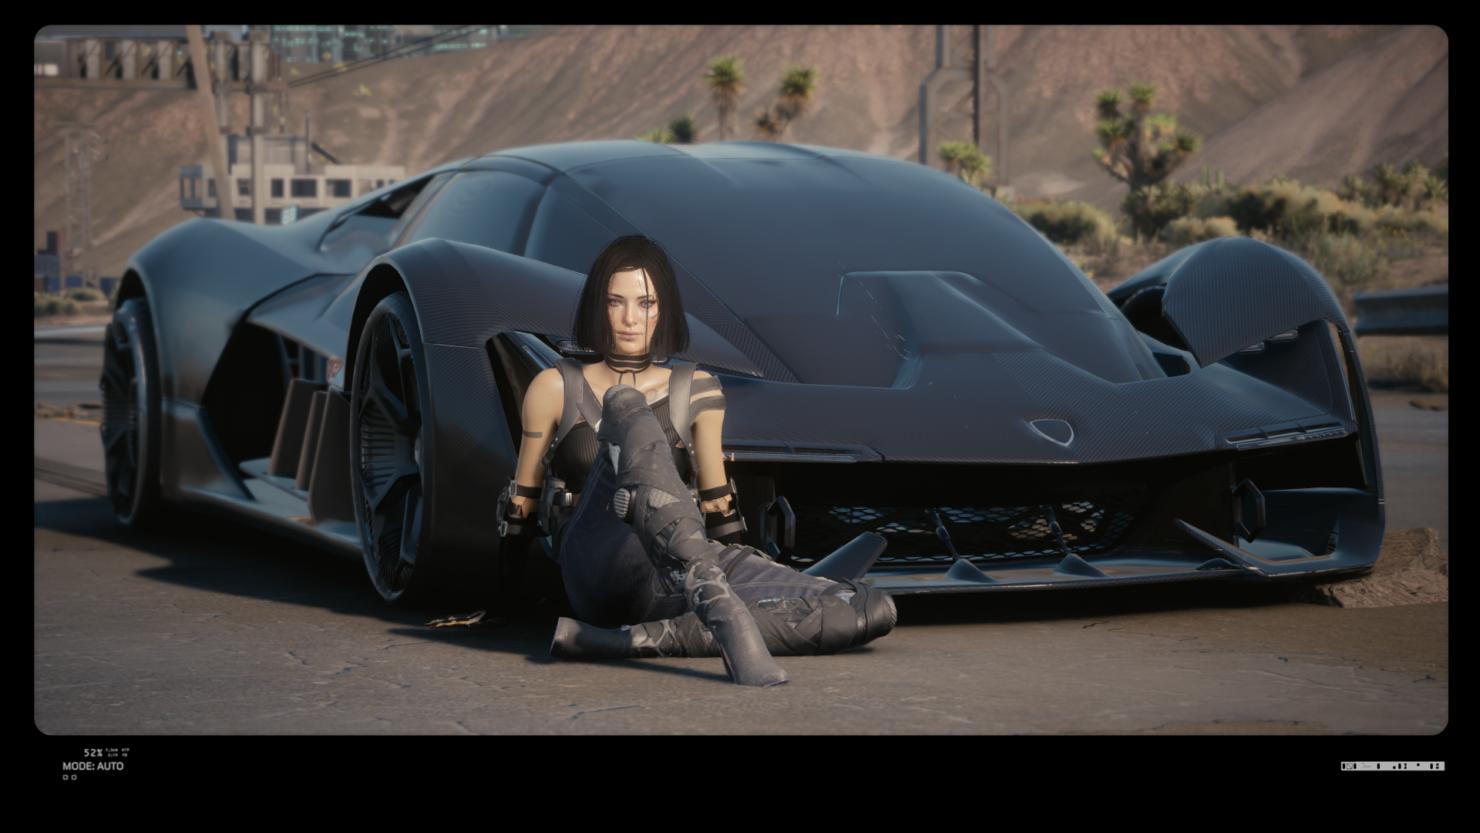 cyberpunk-vehicle-mod-lamborghini-terzo-millennio-electric-hypercar-12